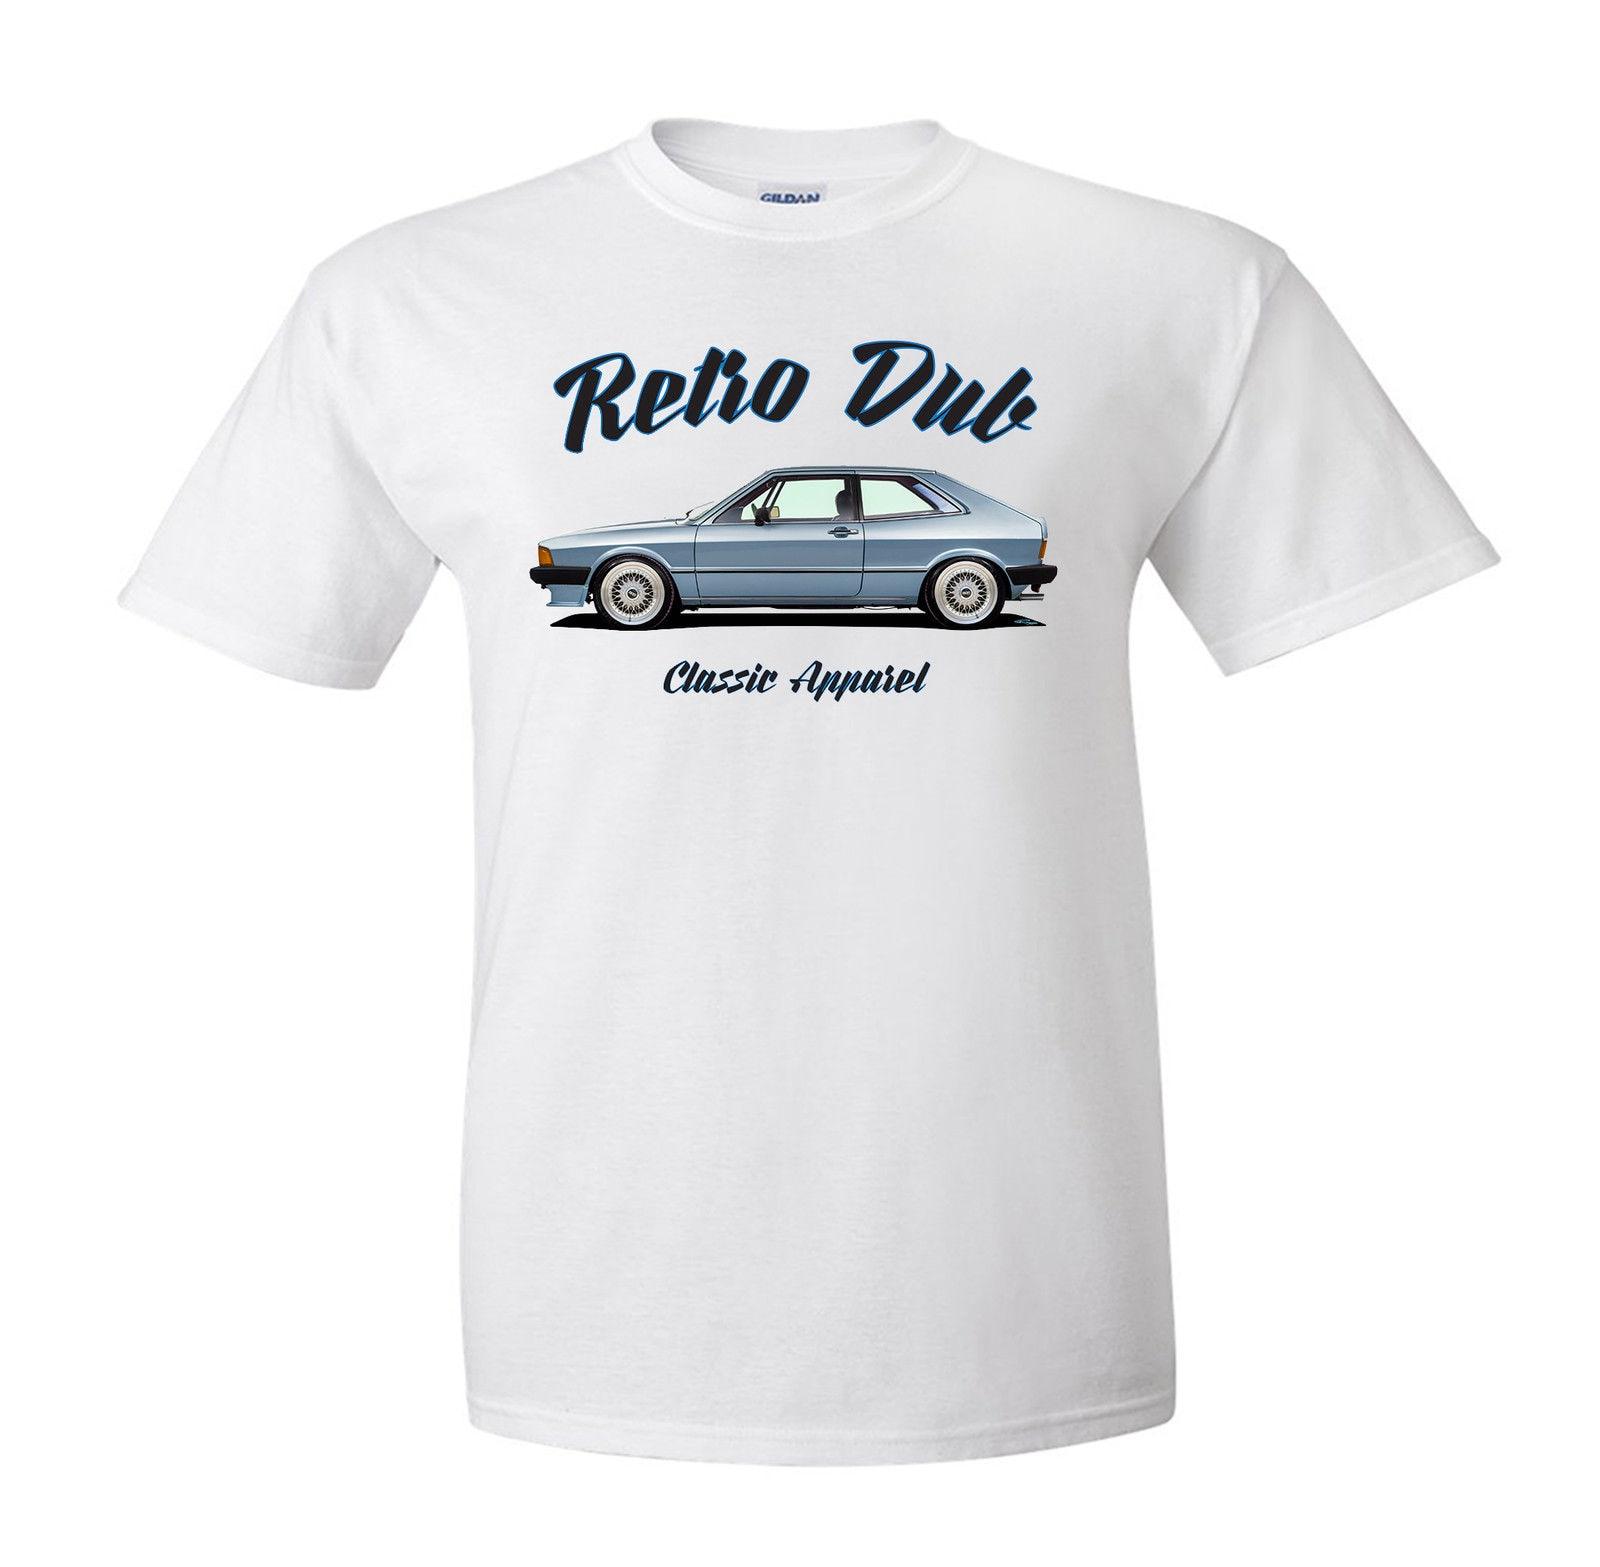 2018 Men High Quality Tees German Classic Car Fans Scirocco Mk1 T-Shirt. Retro Dub , Classic Car, German Modified. Neon T Shirts